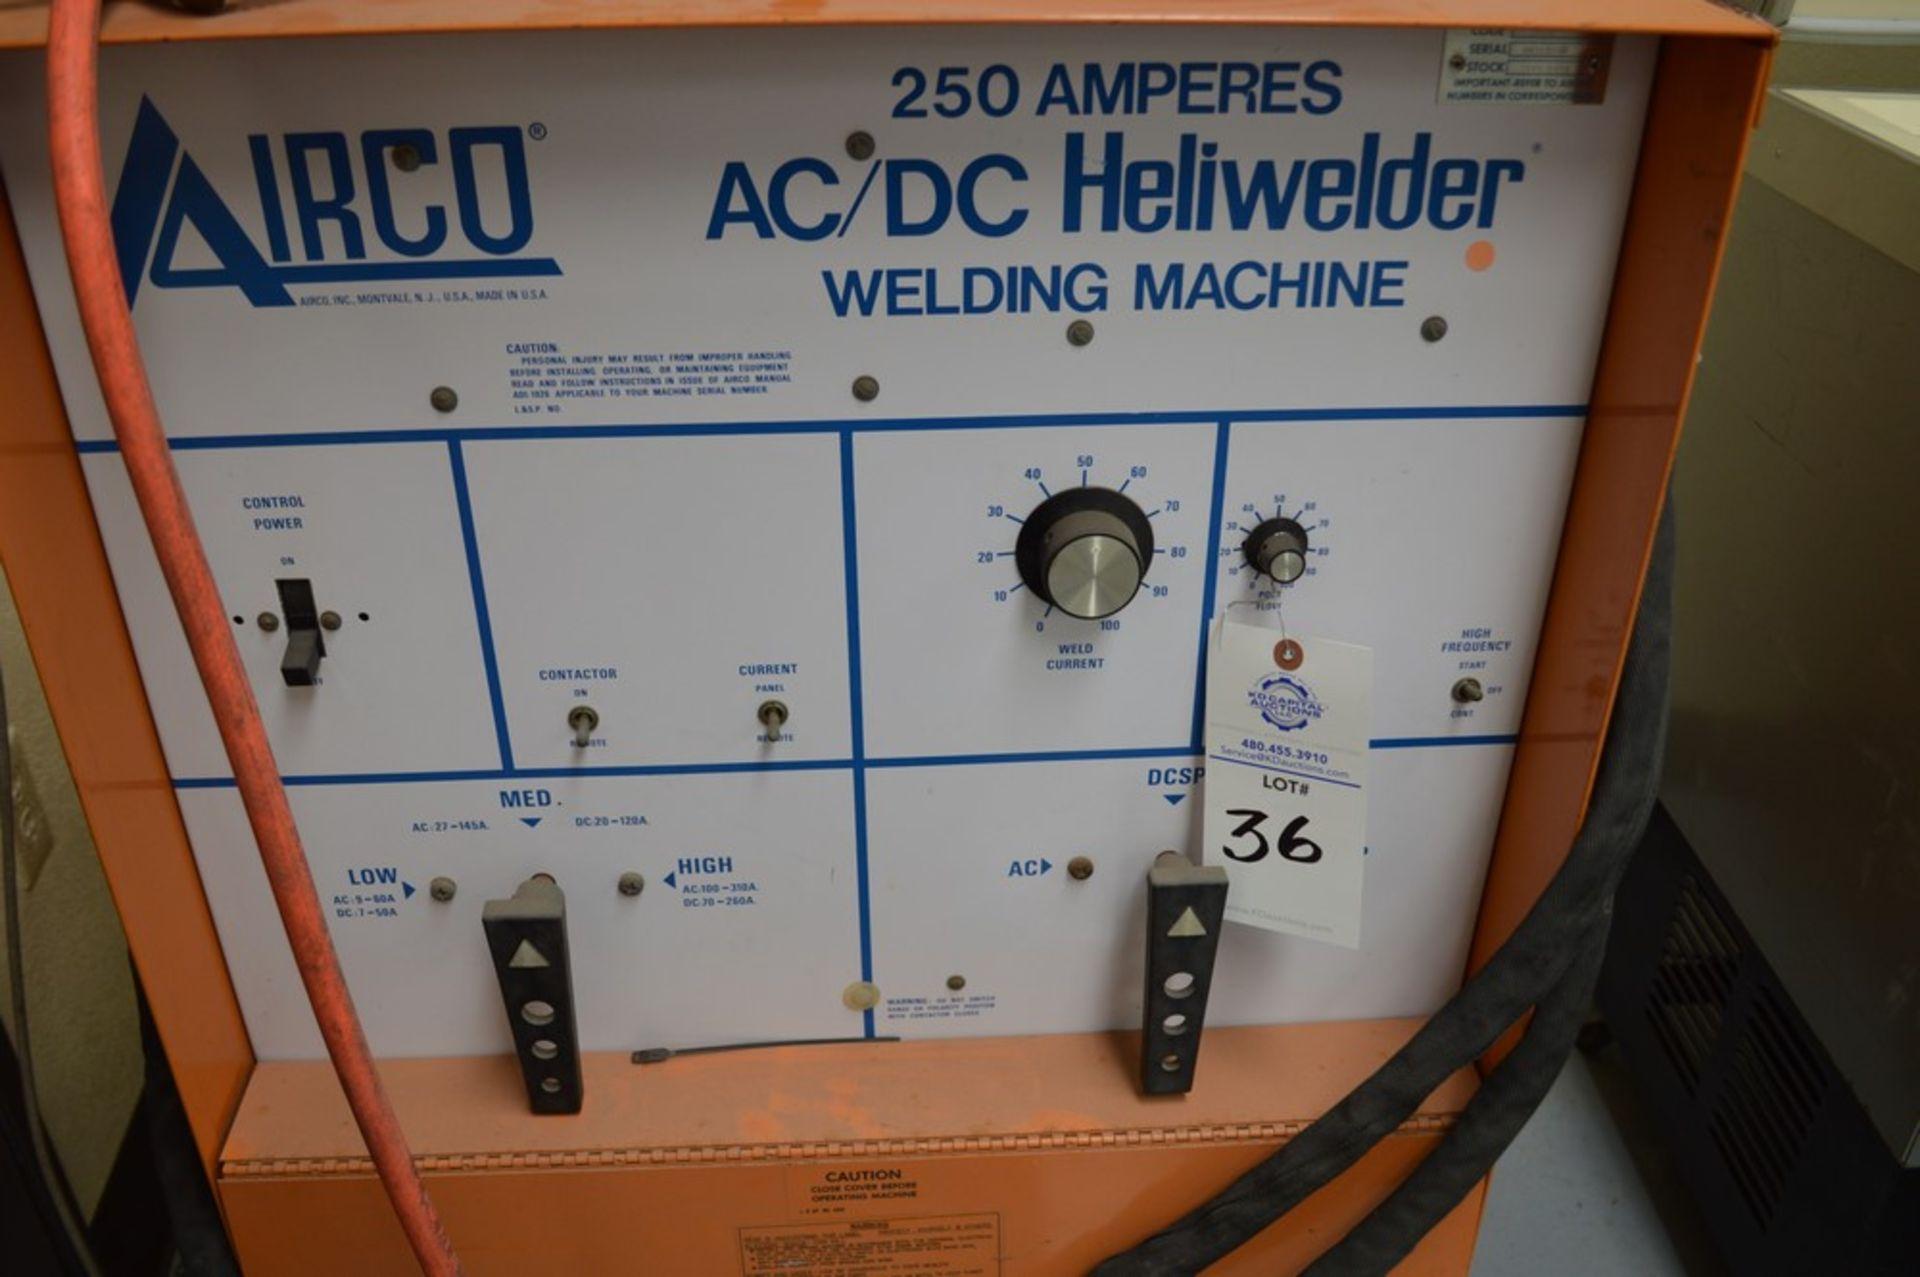 Airco AC/DC Heliwelder, 250 amp welder, AC/DC Tig welder, mounted on rolling steel cart - Image 3 of 5